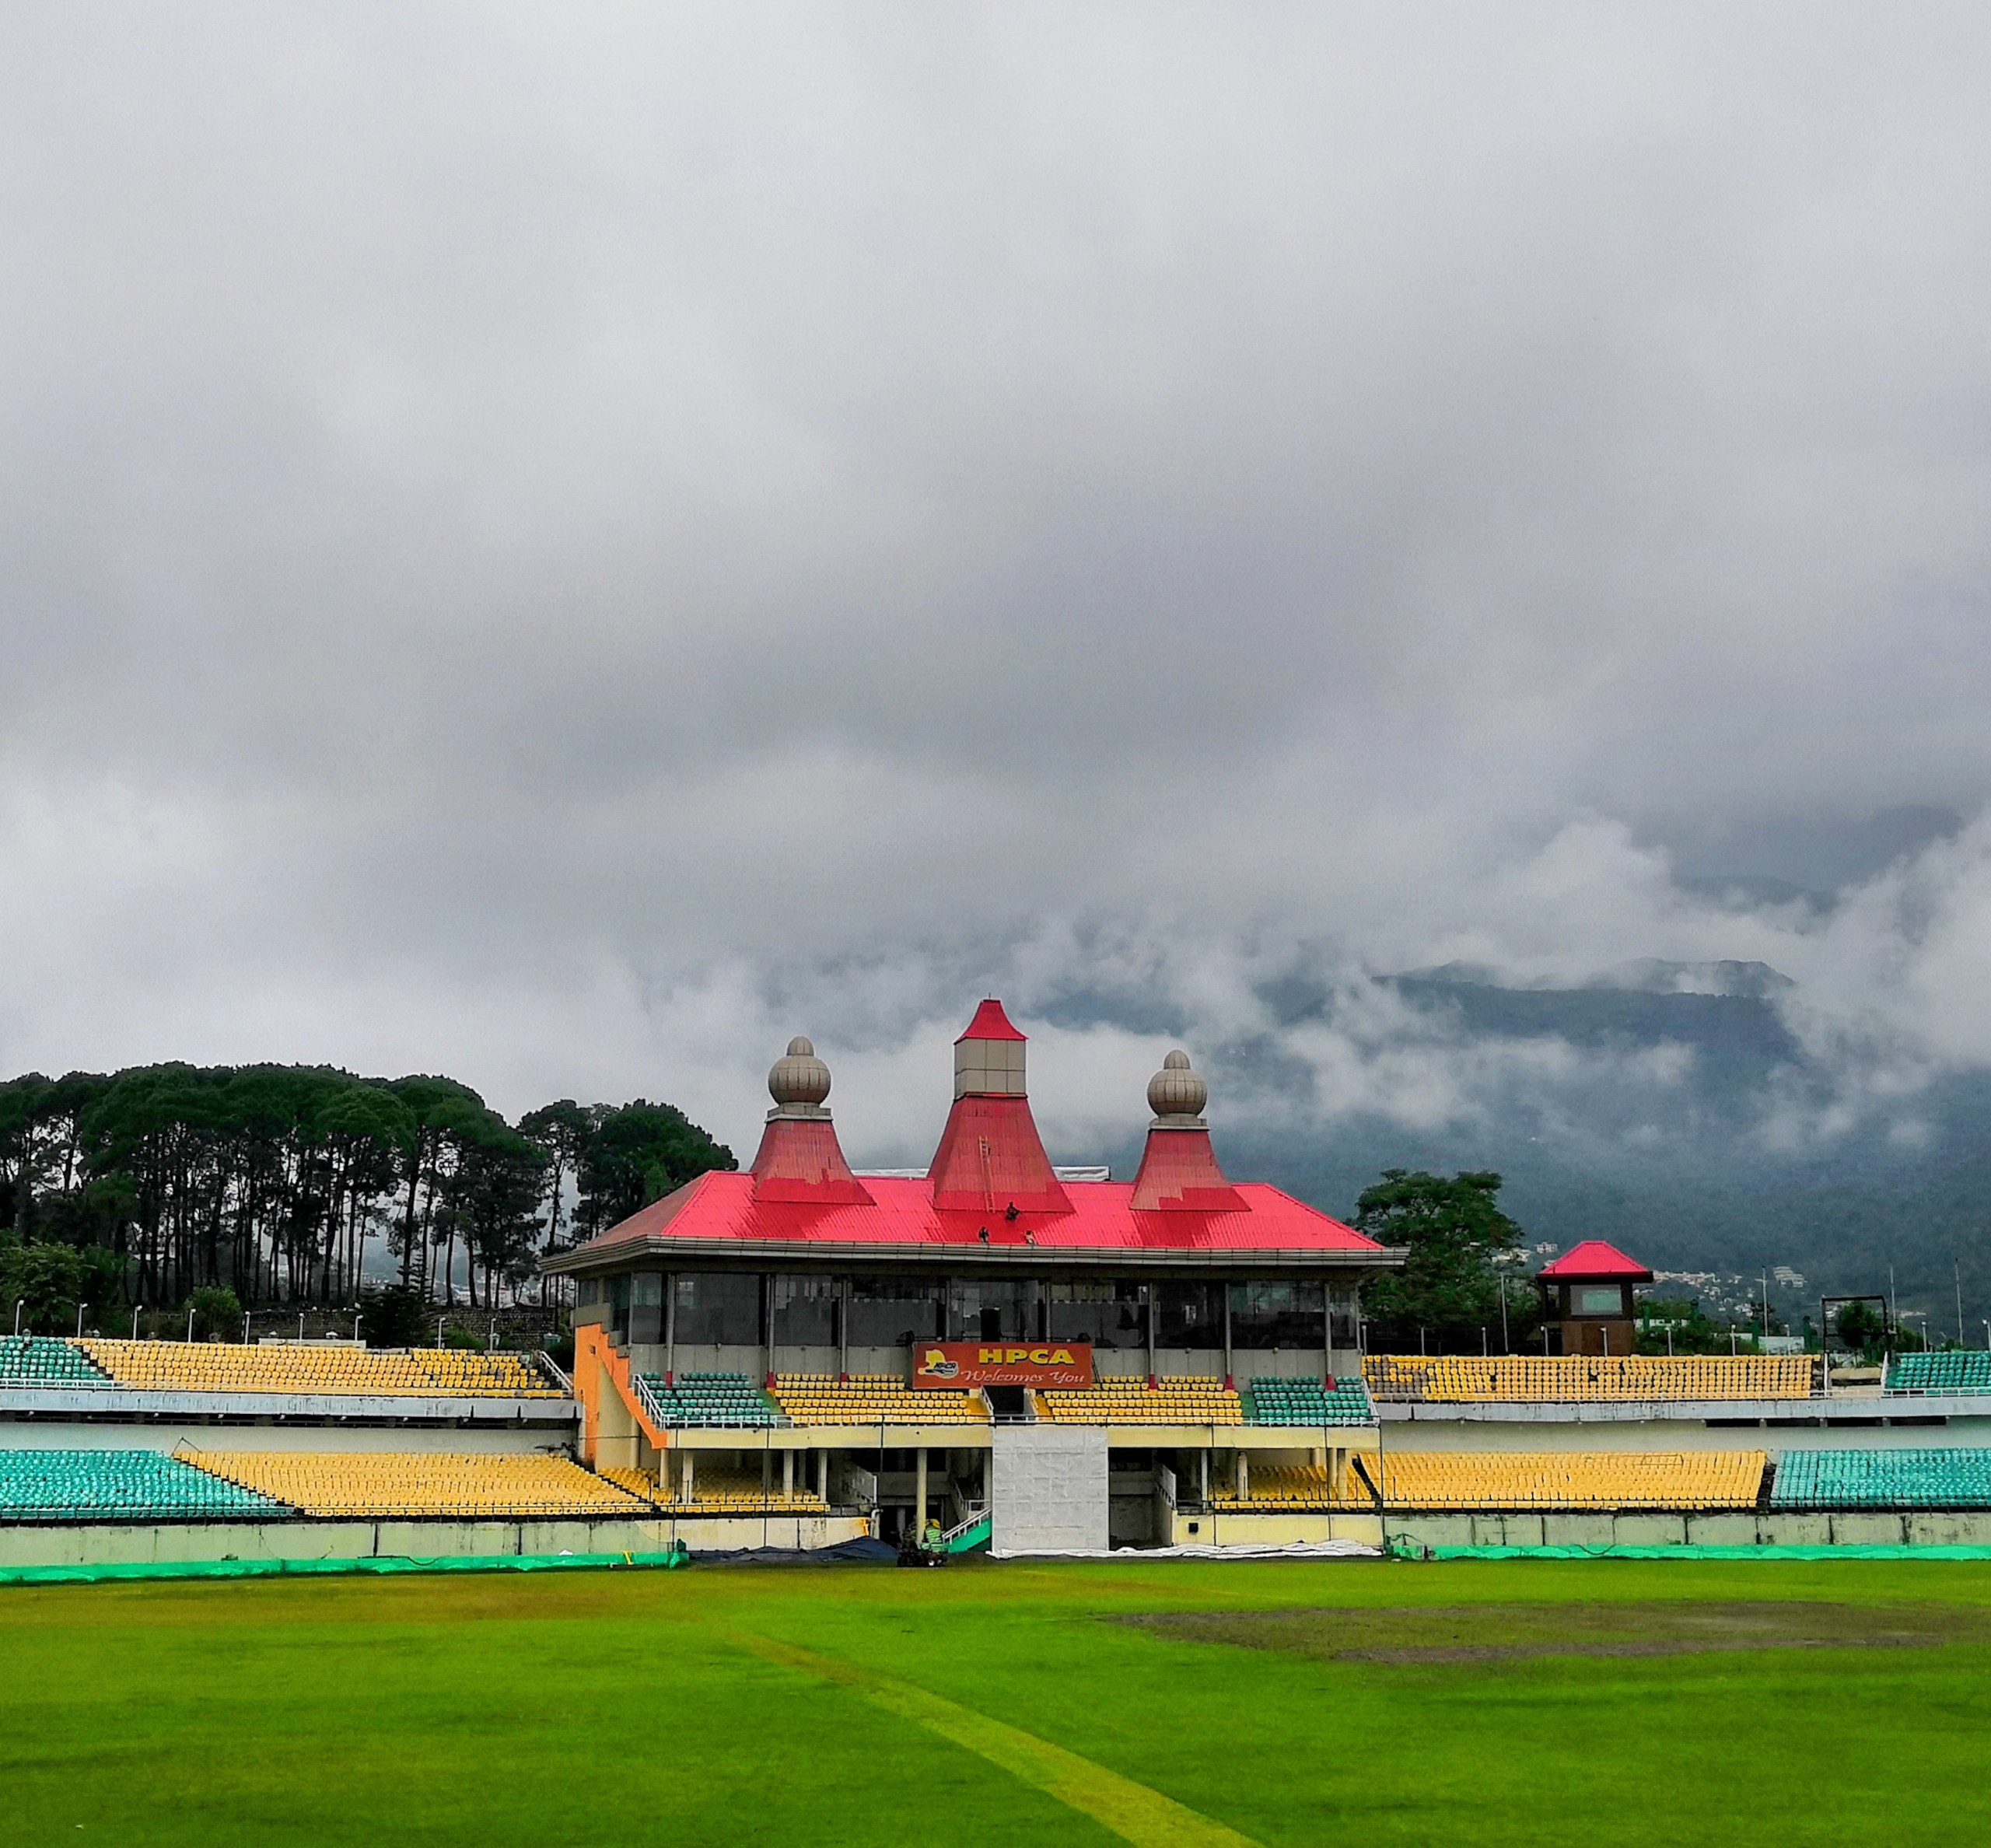 HPCA cricket stadium, Dharamshala